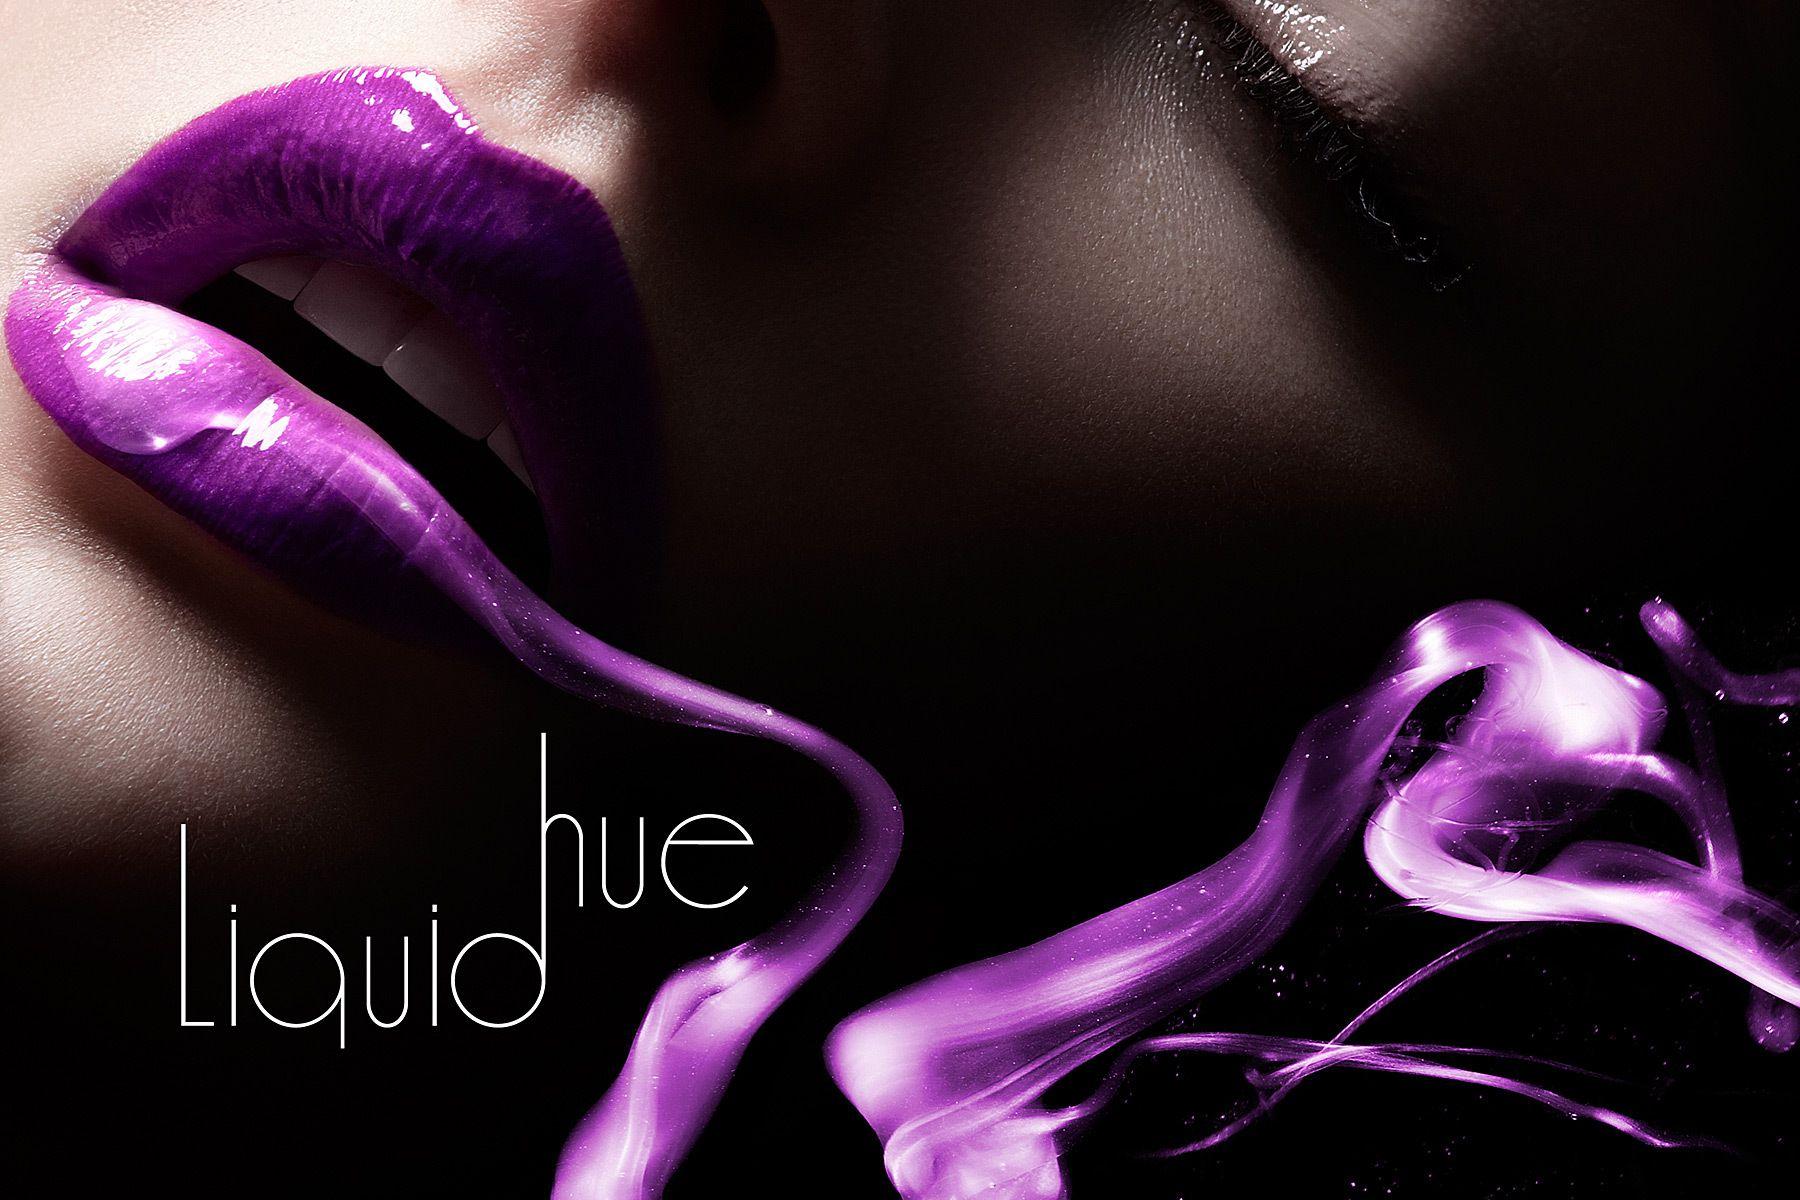 1beauty_liquid_hue_a.jpg